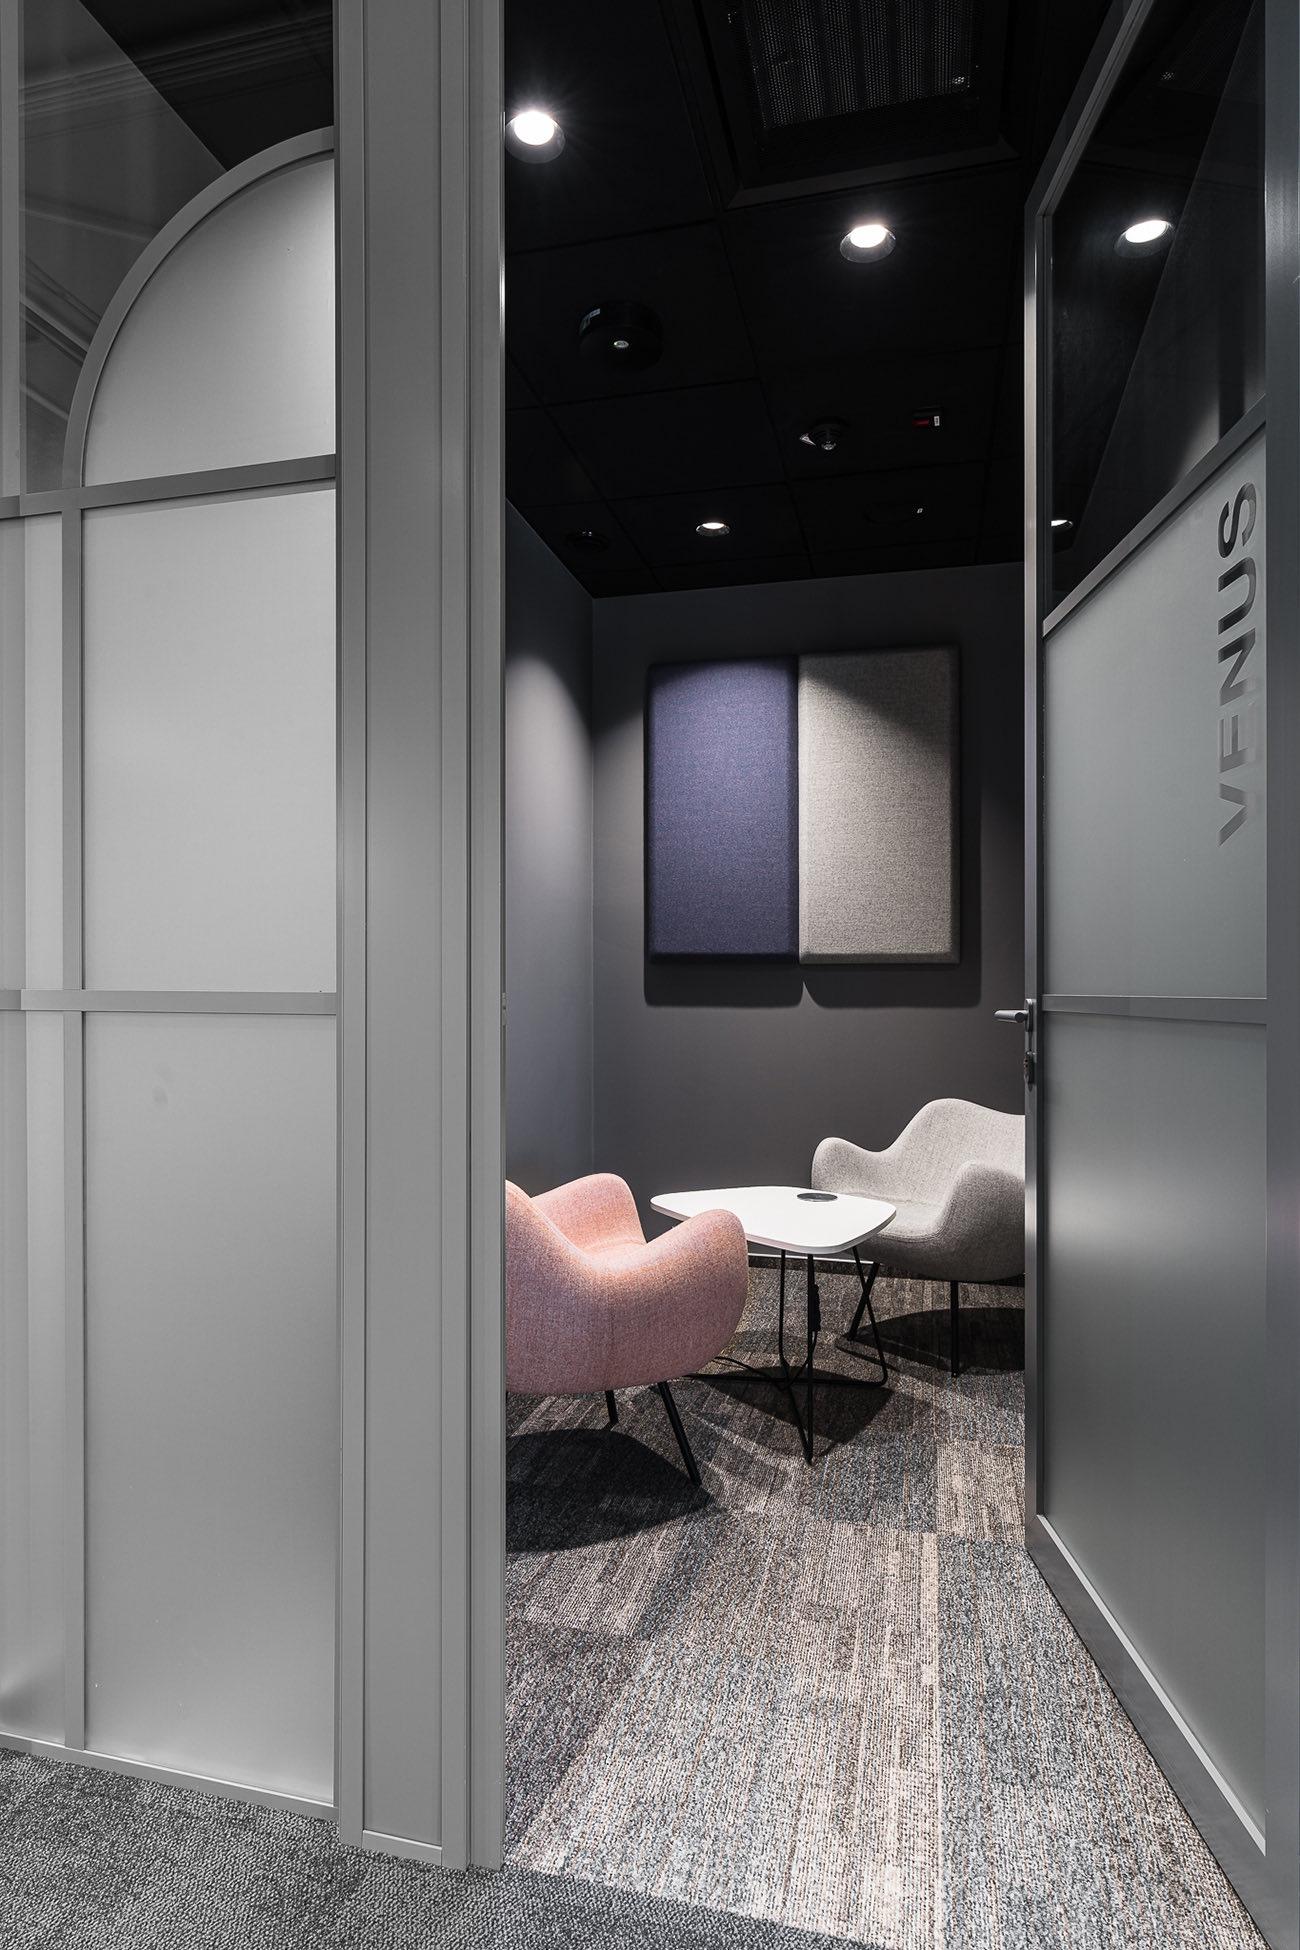 visma-software-office-25